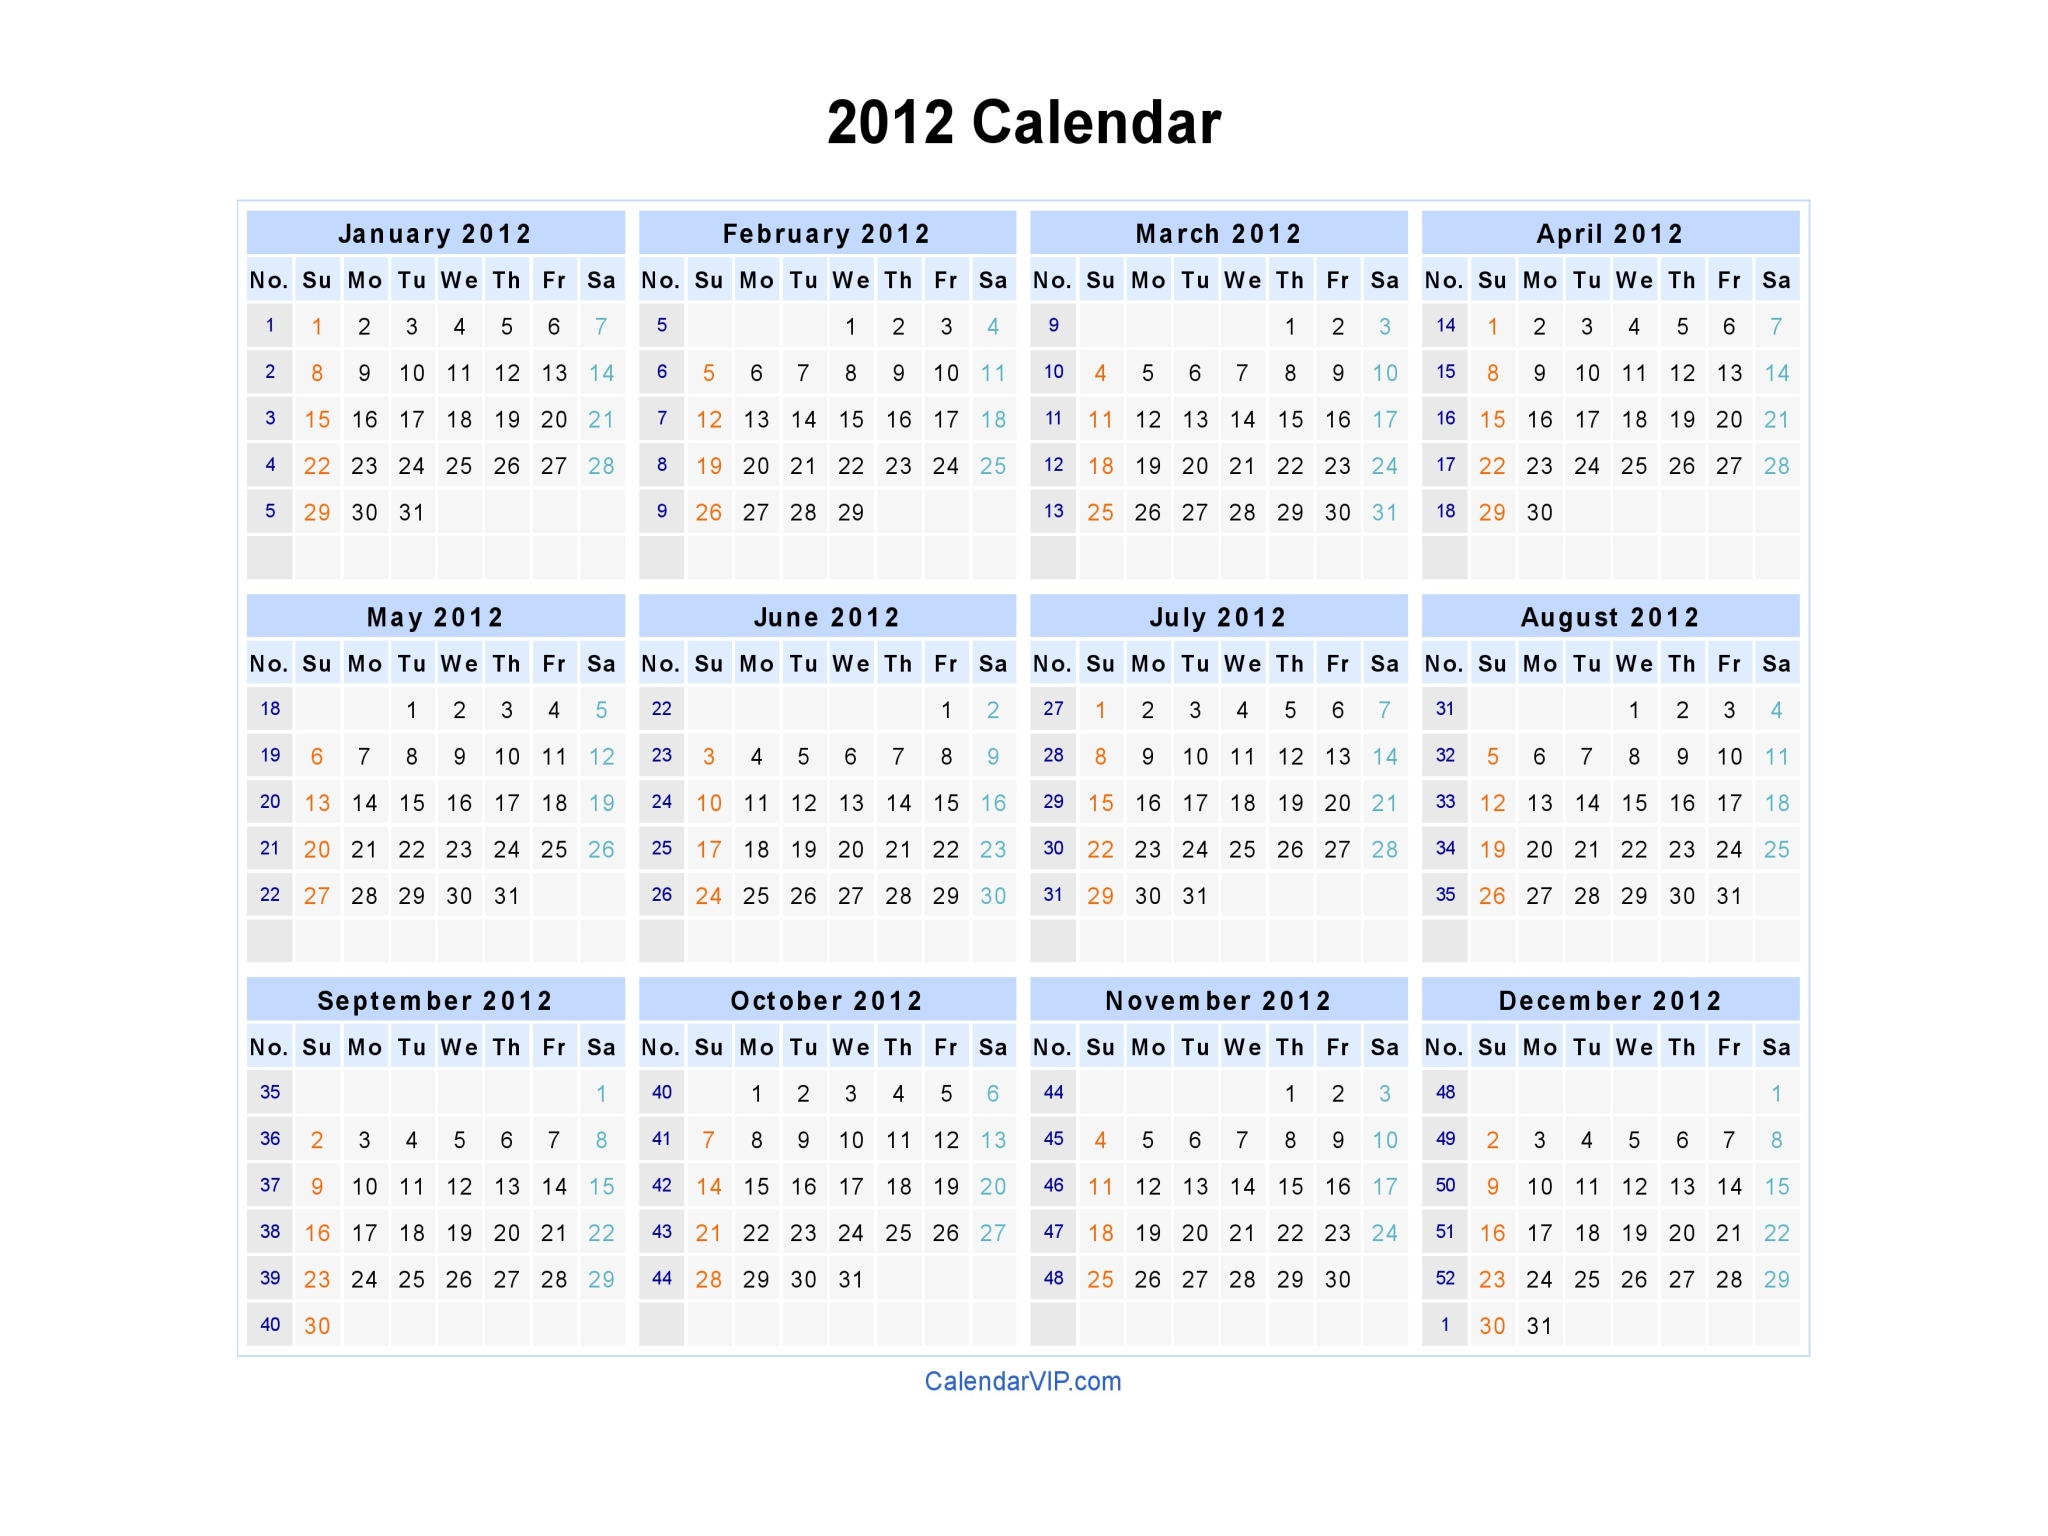 Calendar Template - Blank & Printable Calendar in Word Format